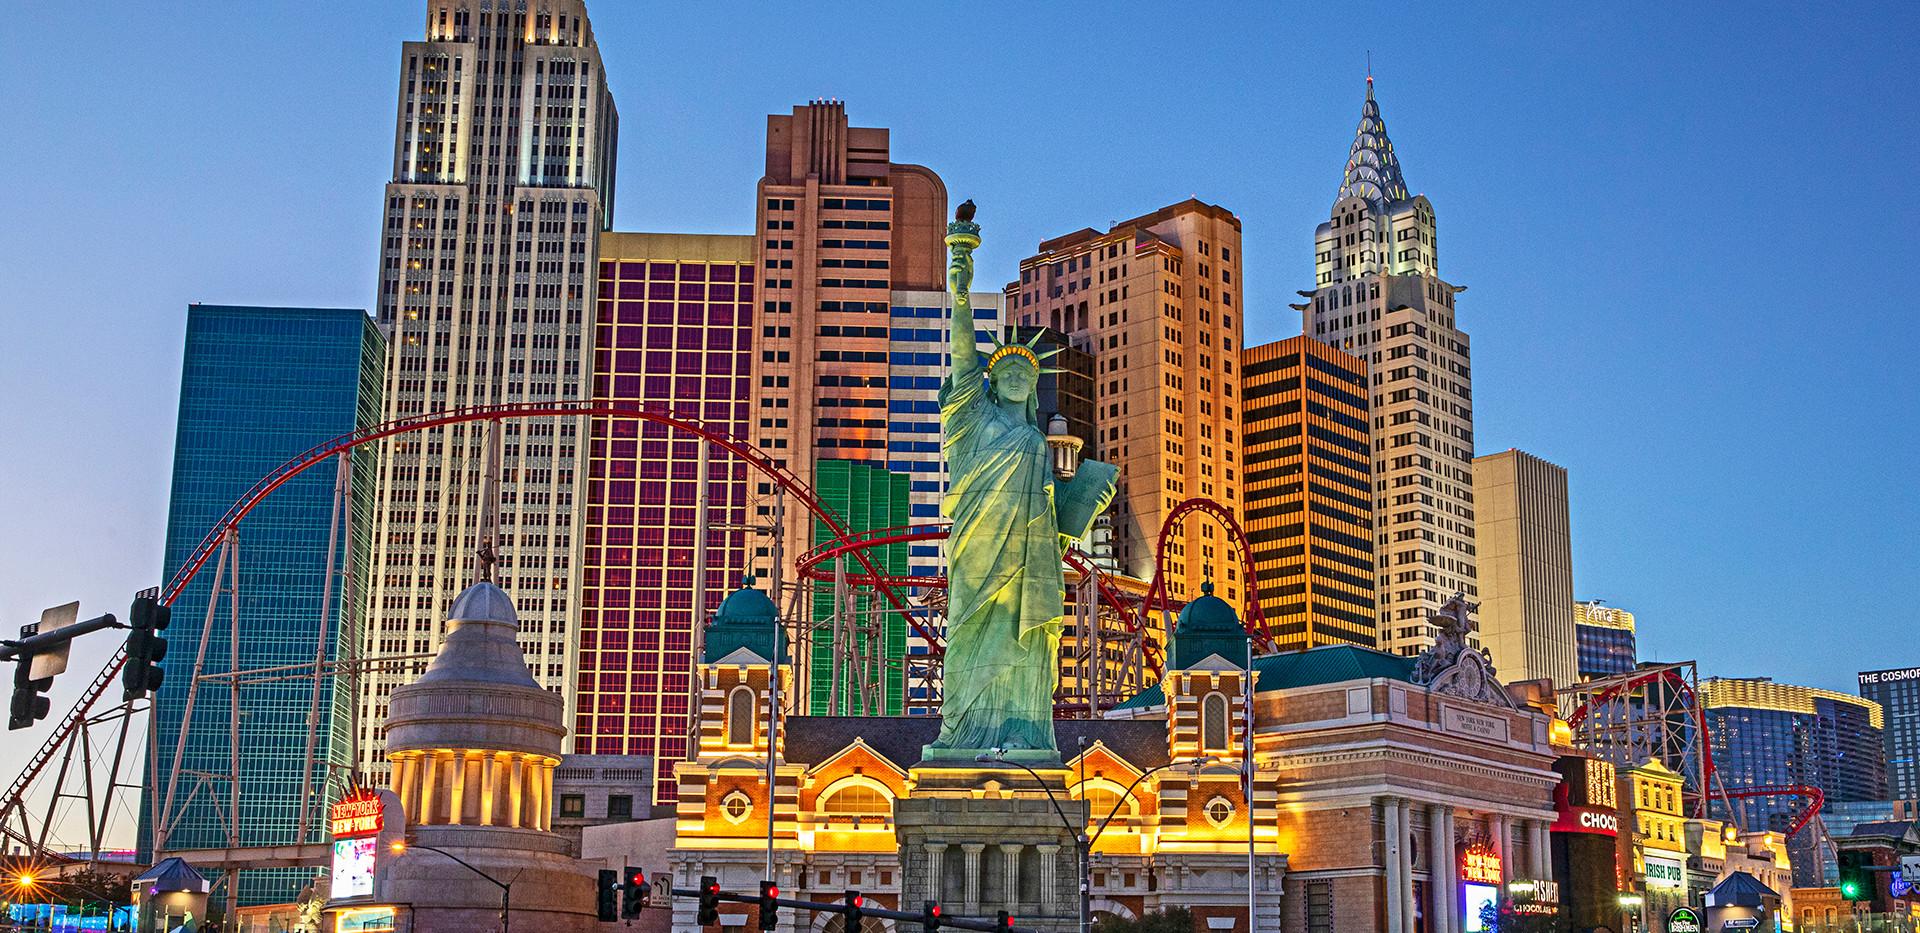 New York New York - Las Vegas